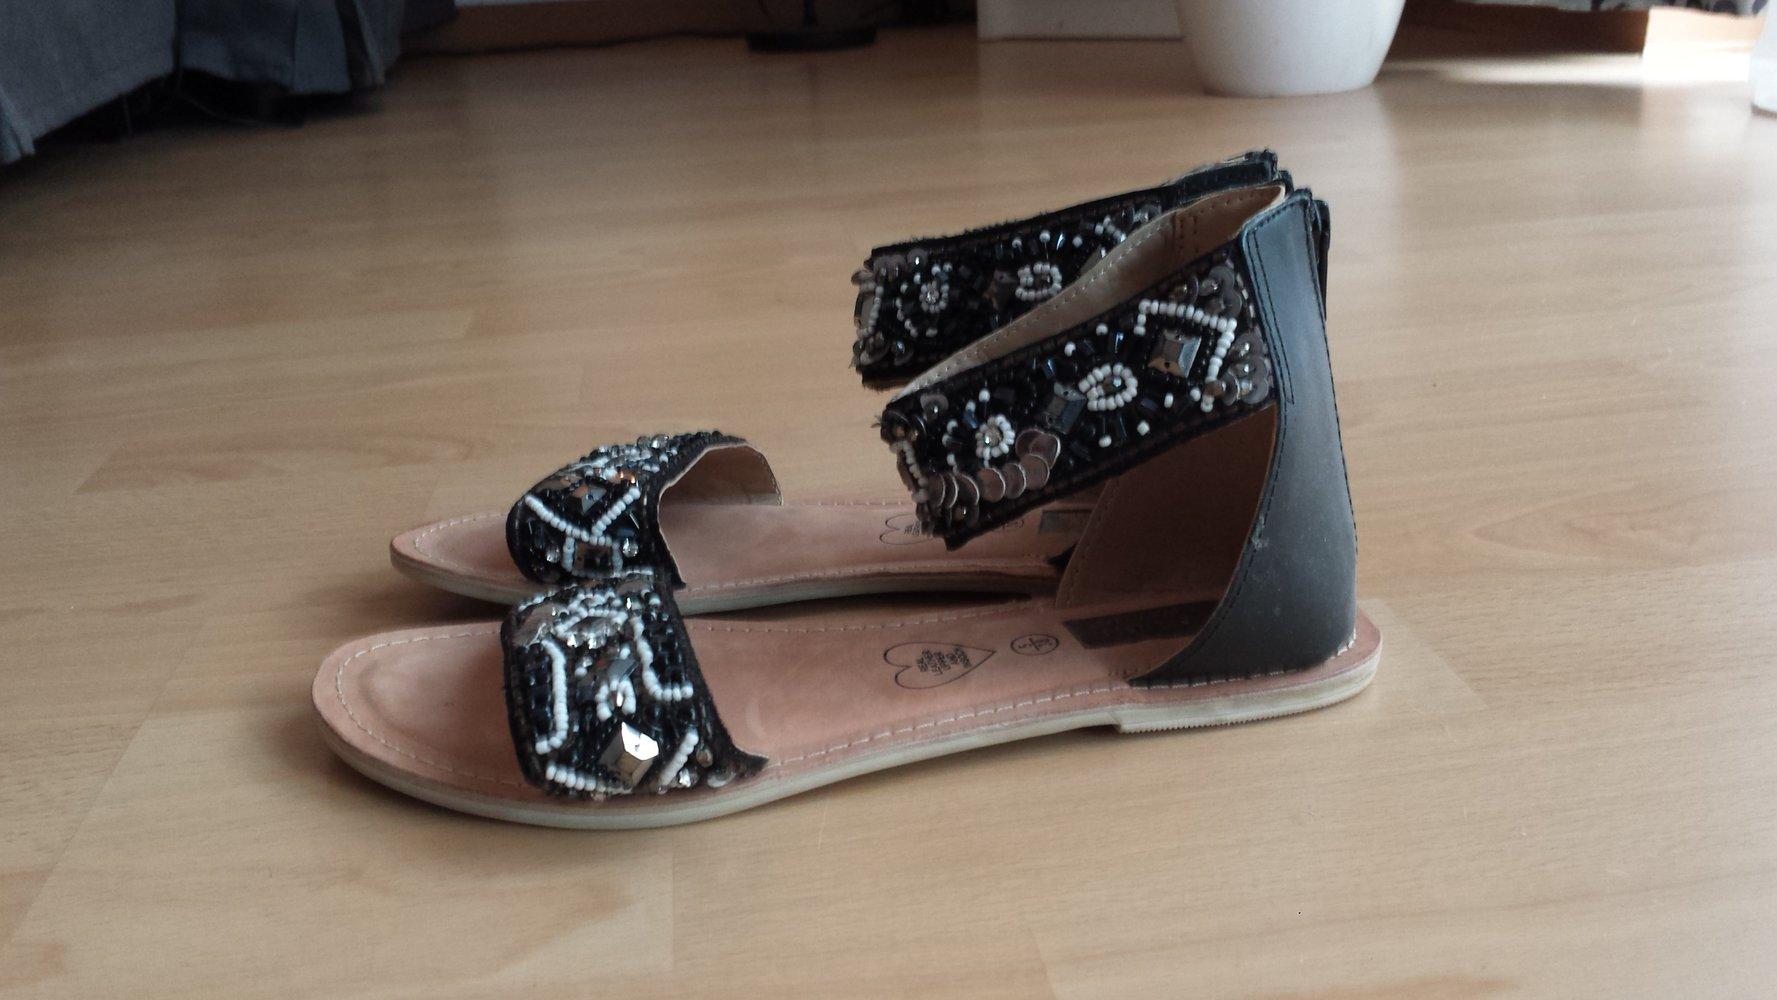 primark sandalen in schwarz glitzer strass neu gr 38. Black Bedroom Furniture Sets. Home Design Ideas